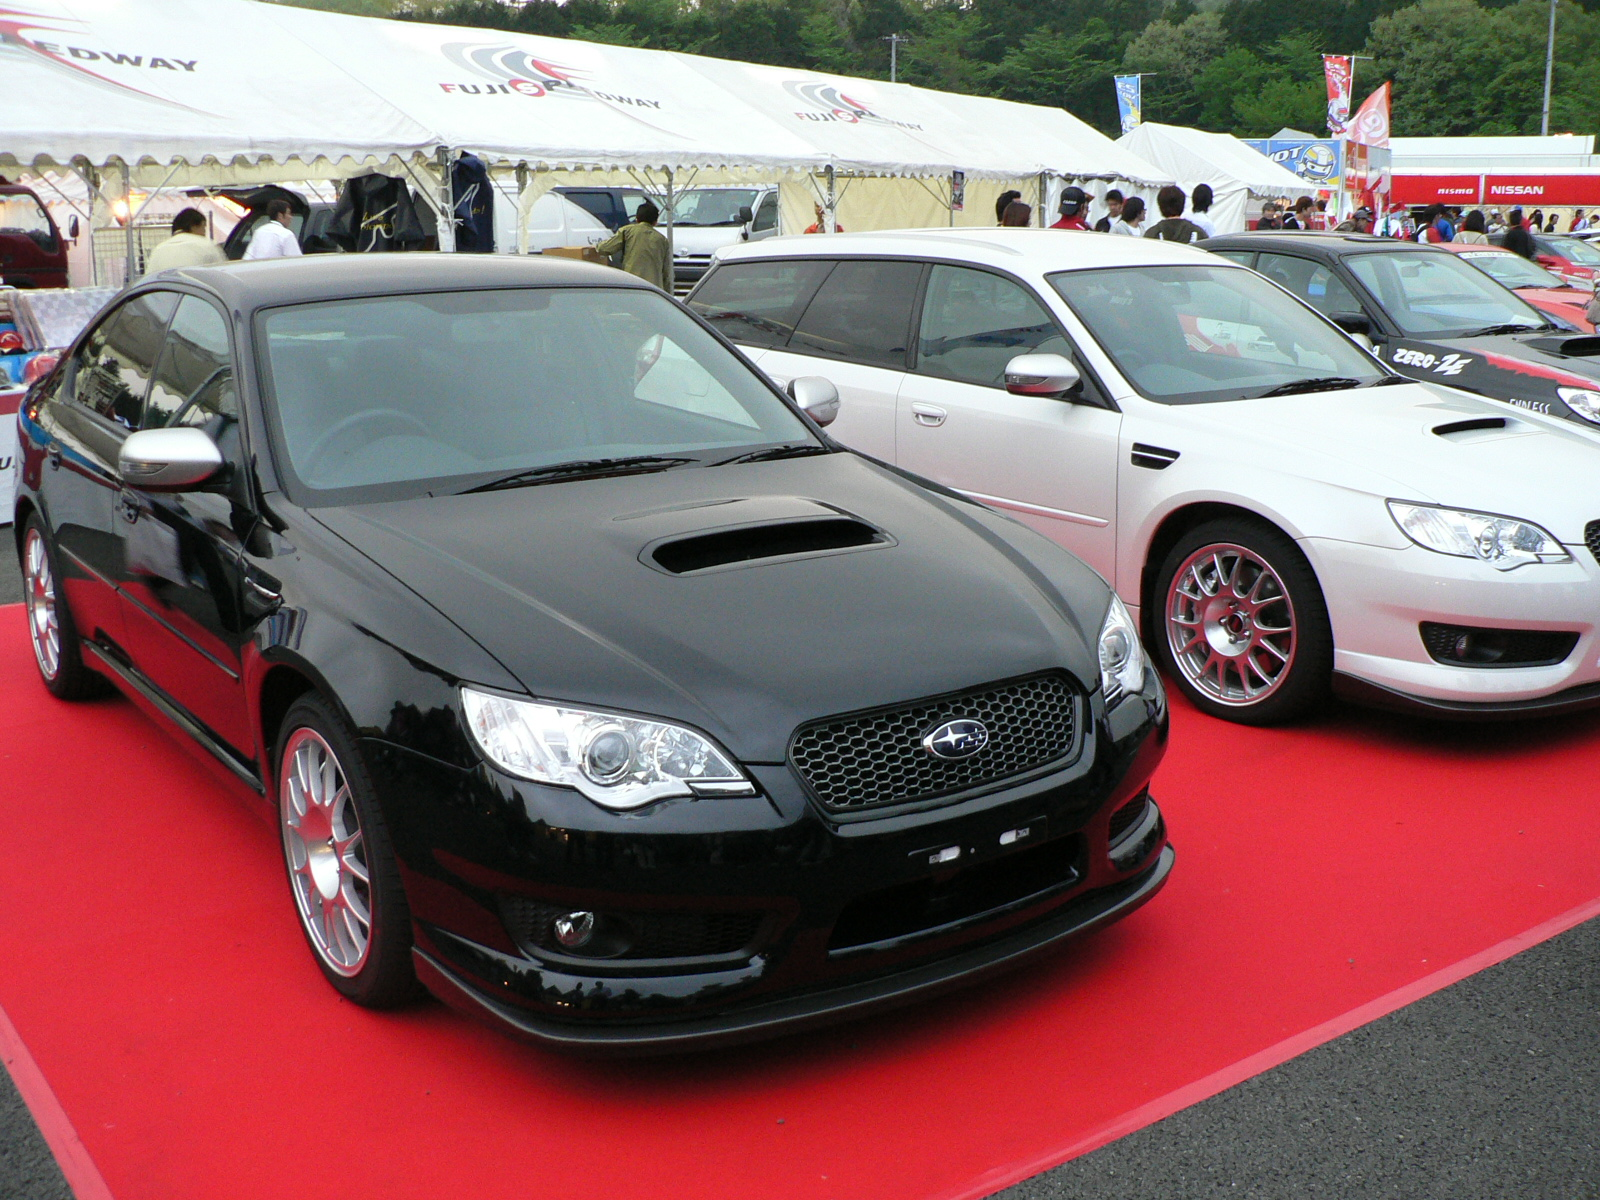 Build Your Own Subaru >> File:LEGACY S402 STI SDN and WGN 01.JPG - Wikimedia Commons